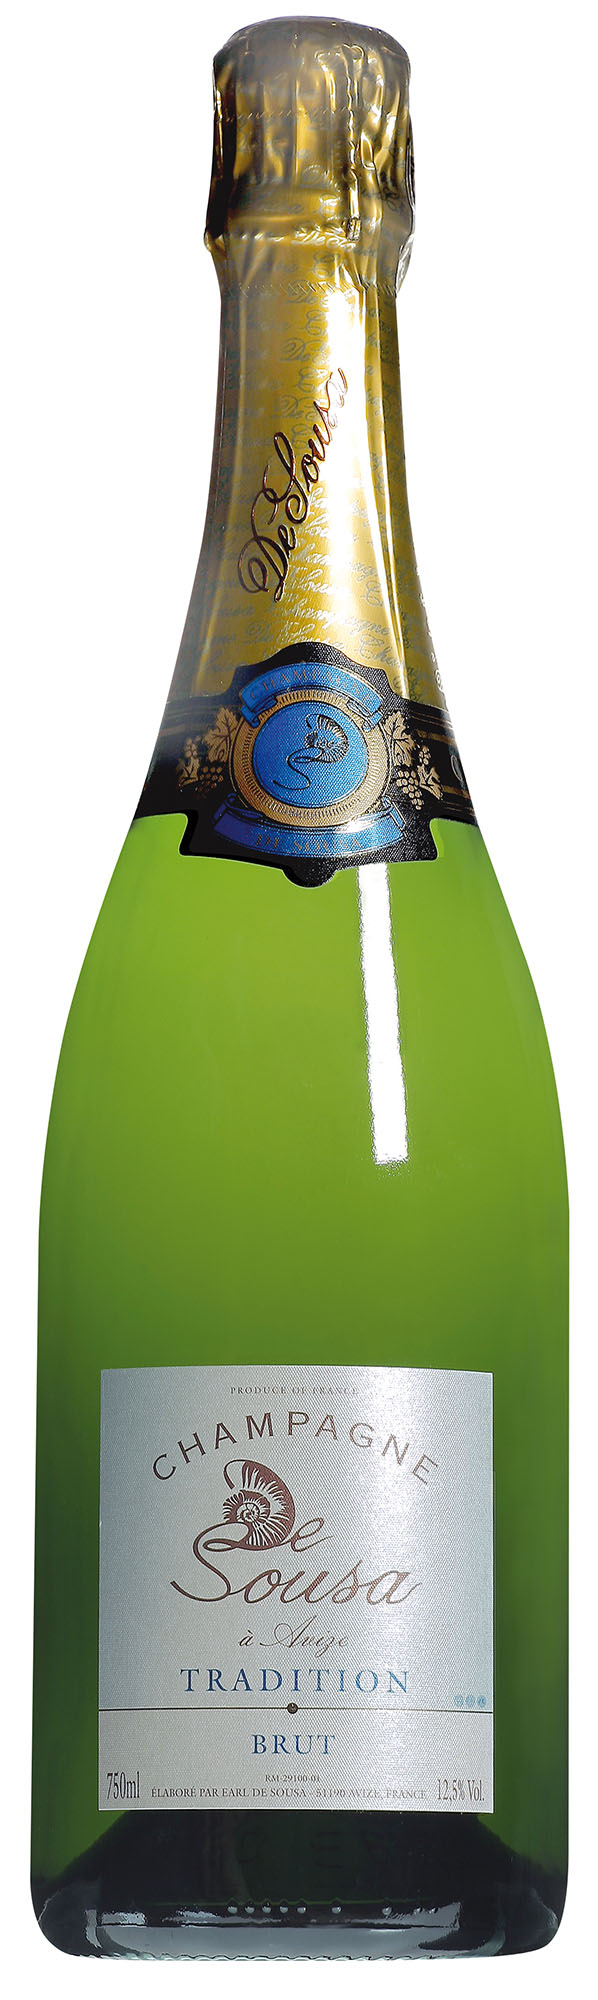 De Sousa Champagne Tradition Brut